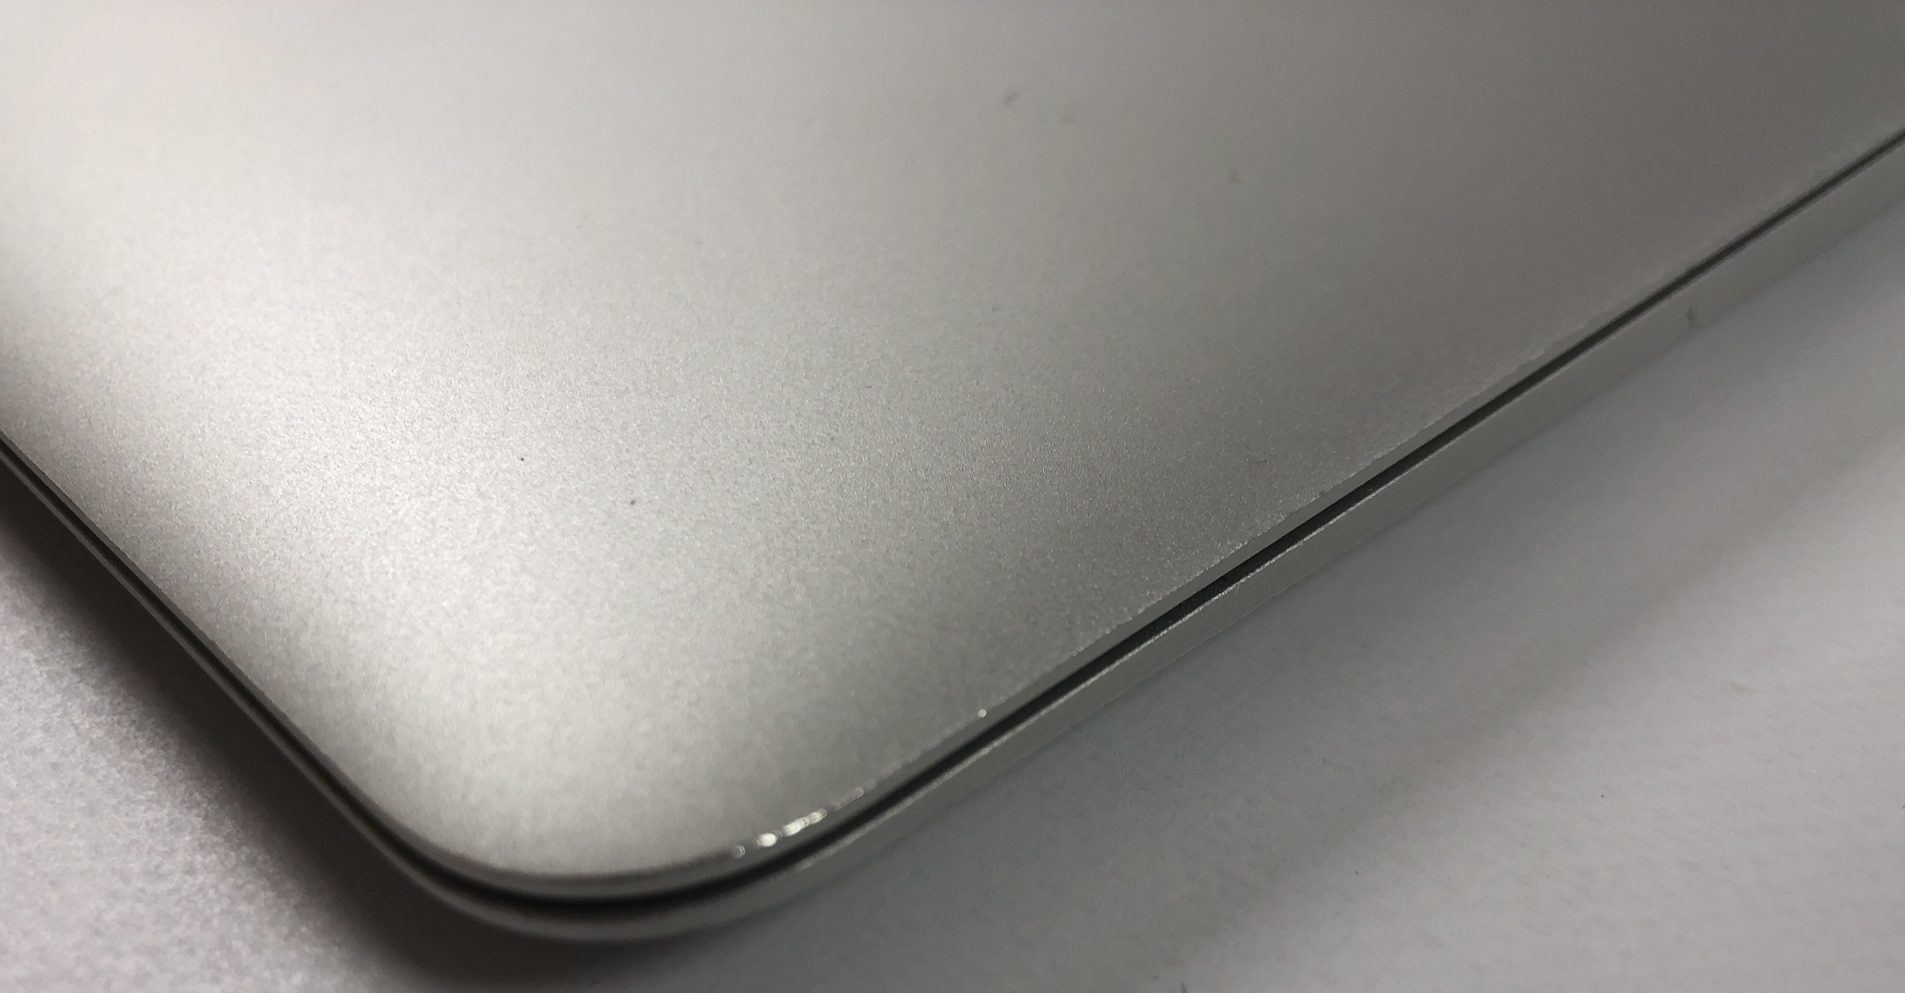 "MacBook Air 13"" Early 2015 (Intel Core i5 1.6 GHz 8 GB RAM 128 GB SSD), Intel Core i5 1.6 GHz, 8 GB RAM, 128 GB SSD, Kuva 3"